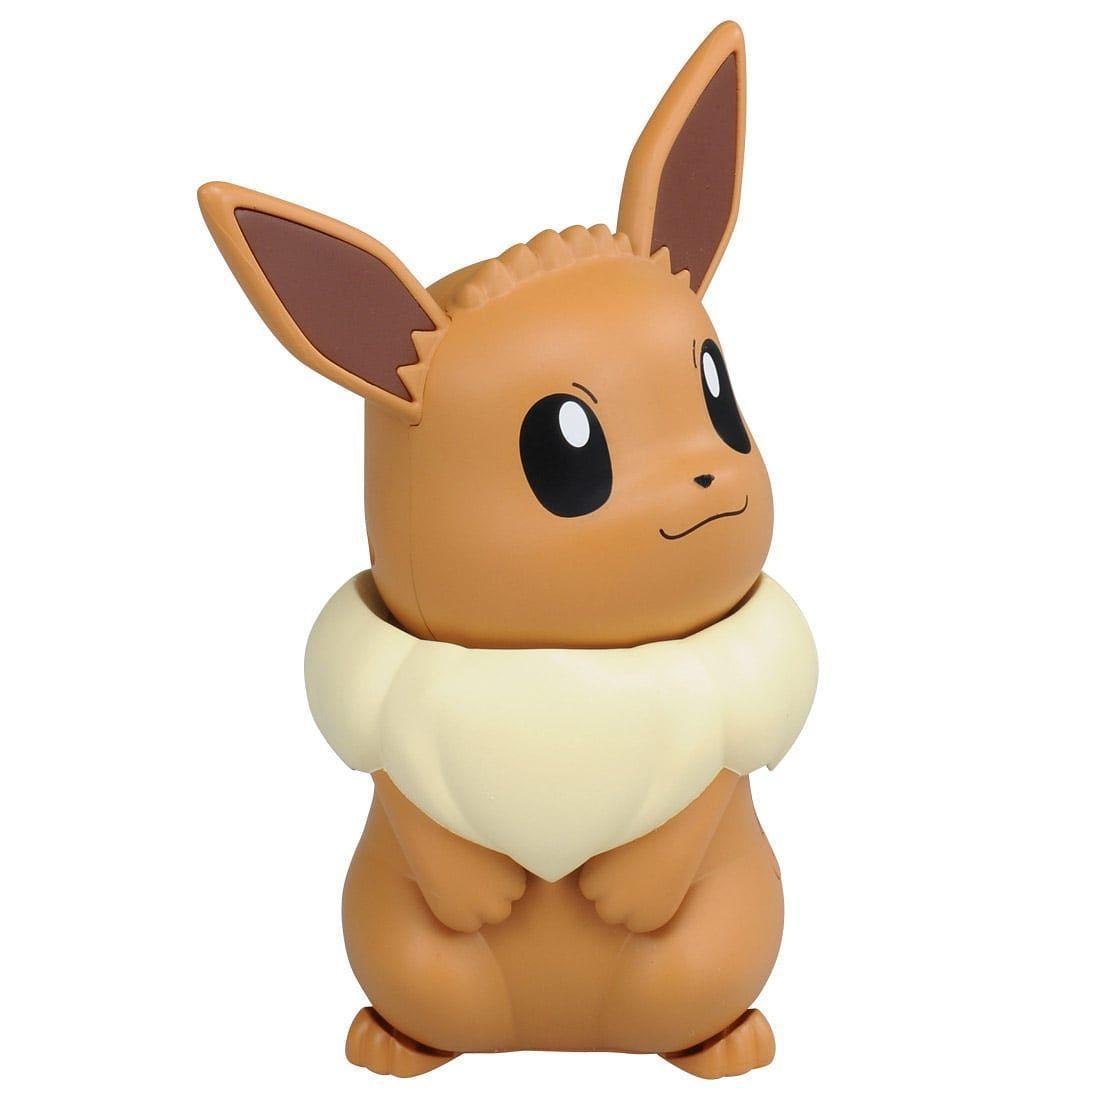 Pokemon Hey HelloVui (Eevee) image